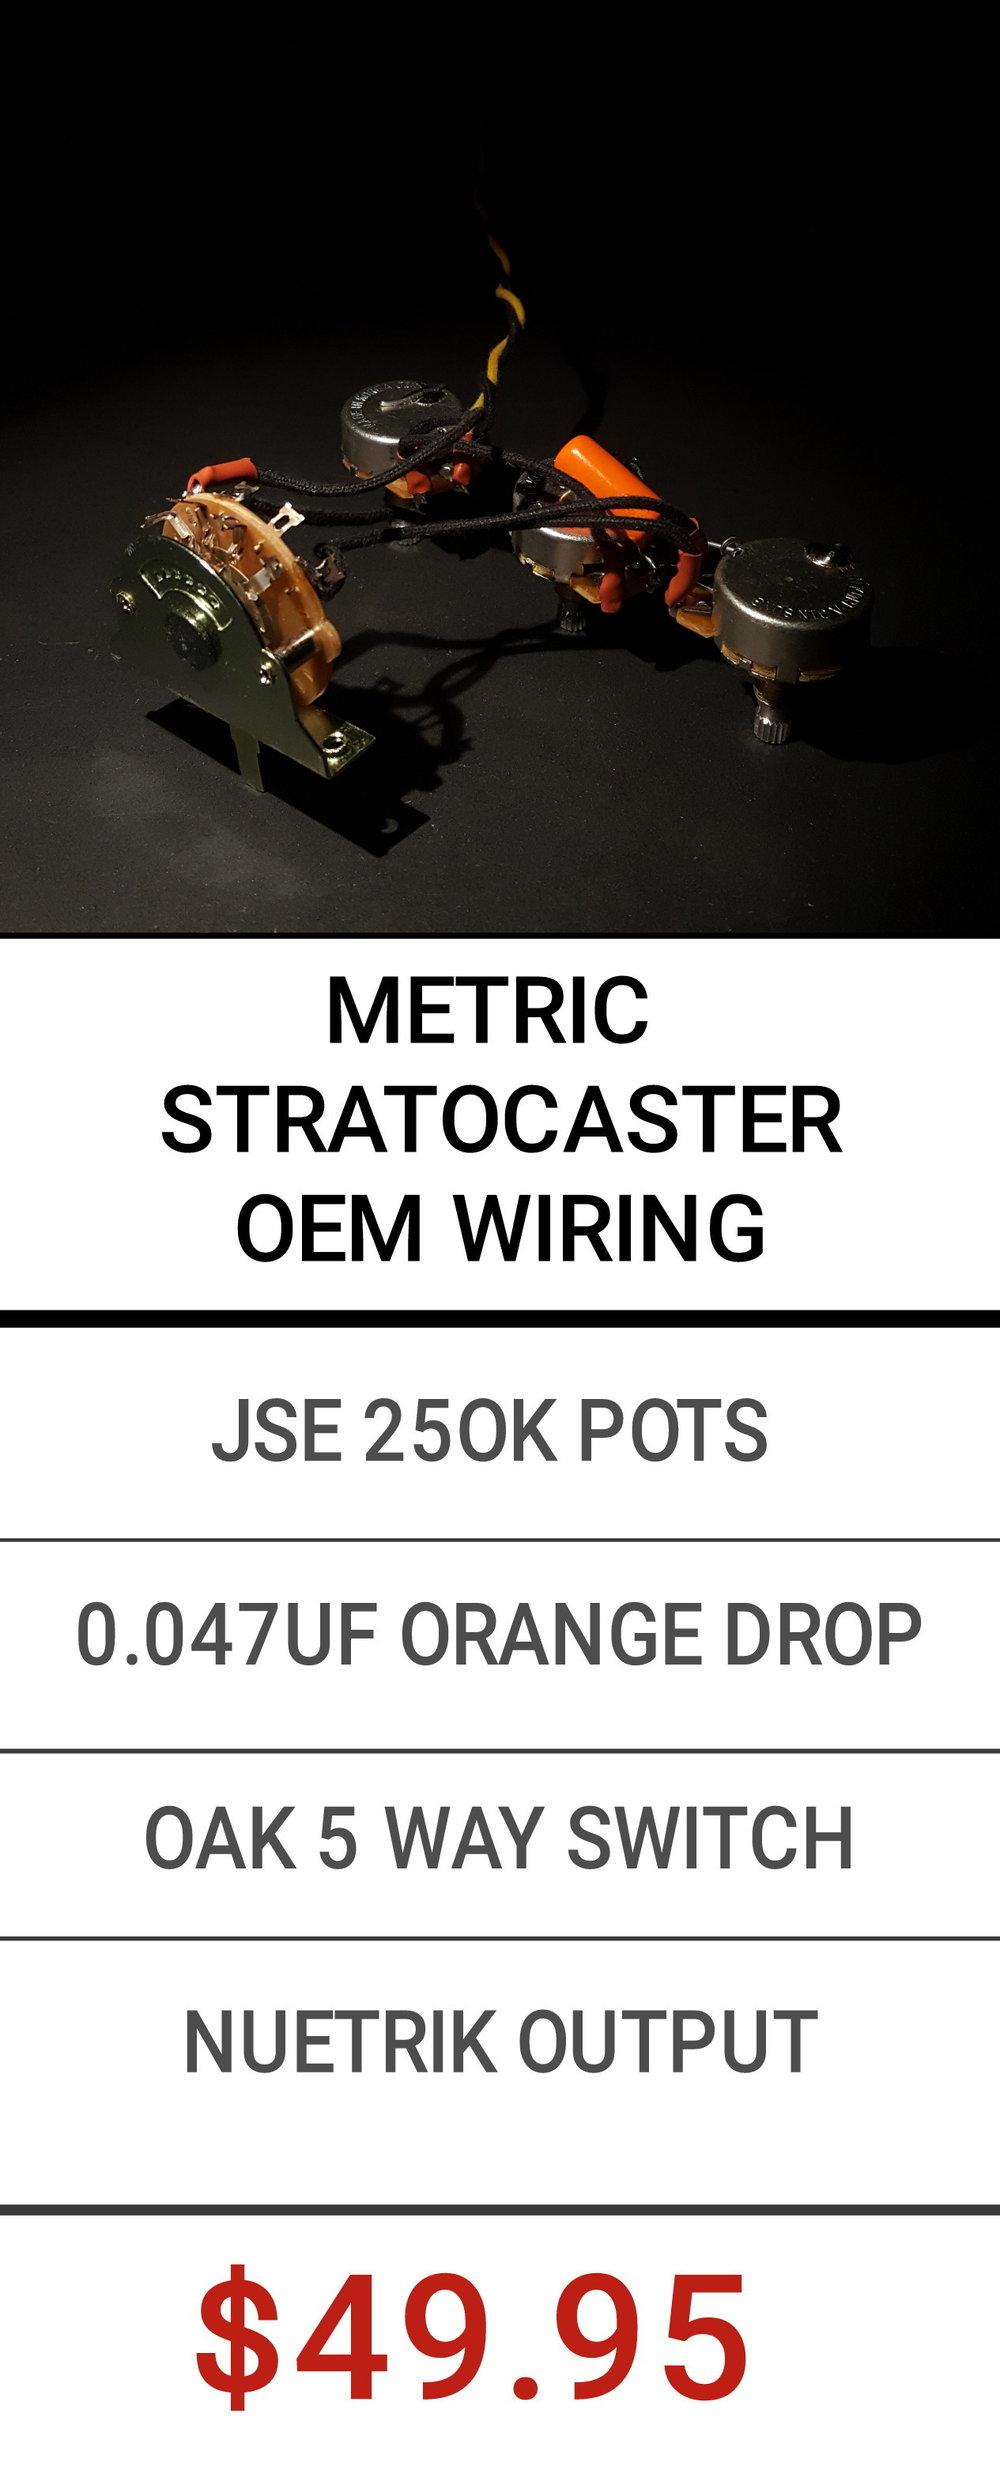 metric oem strat-picsay.jpg